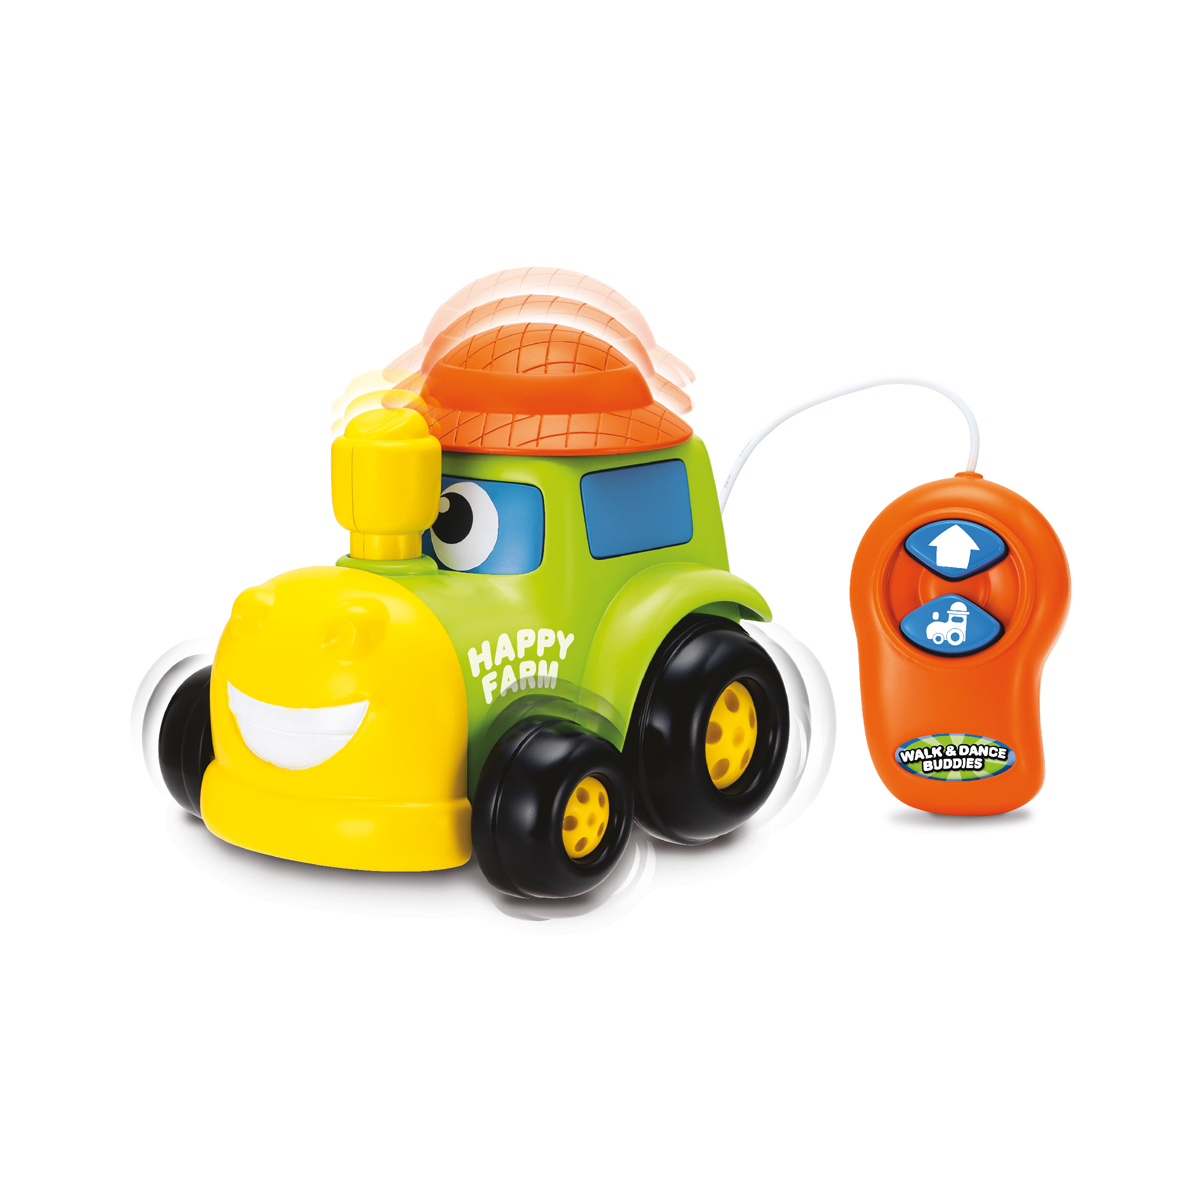 KID, Lek o lär fordon sladdstyrd